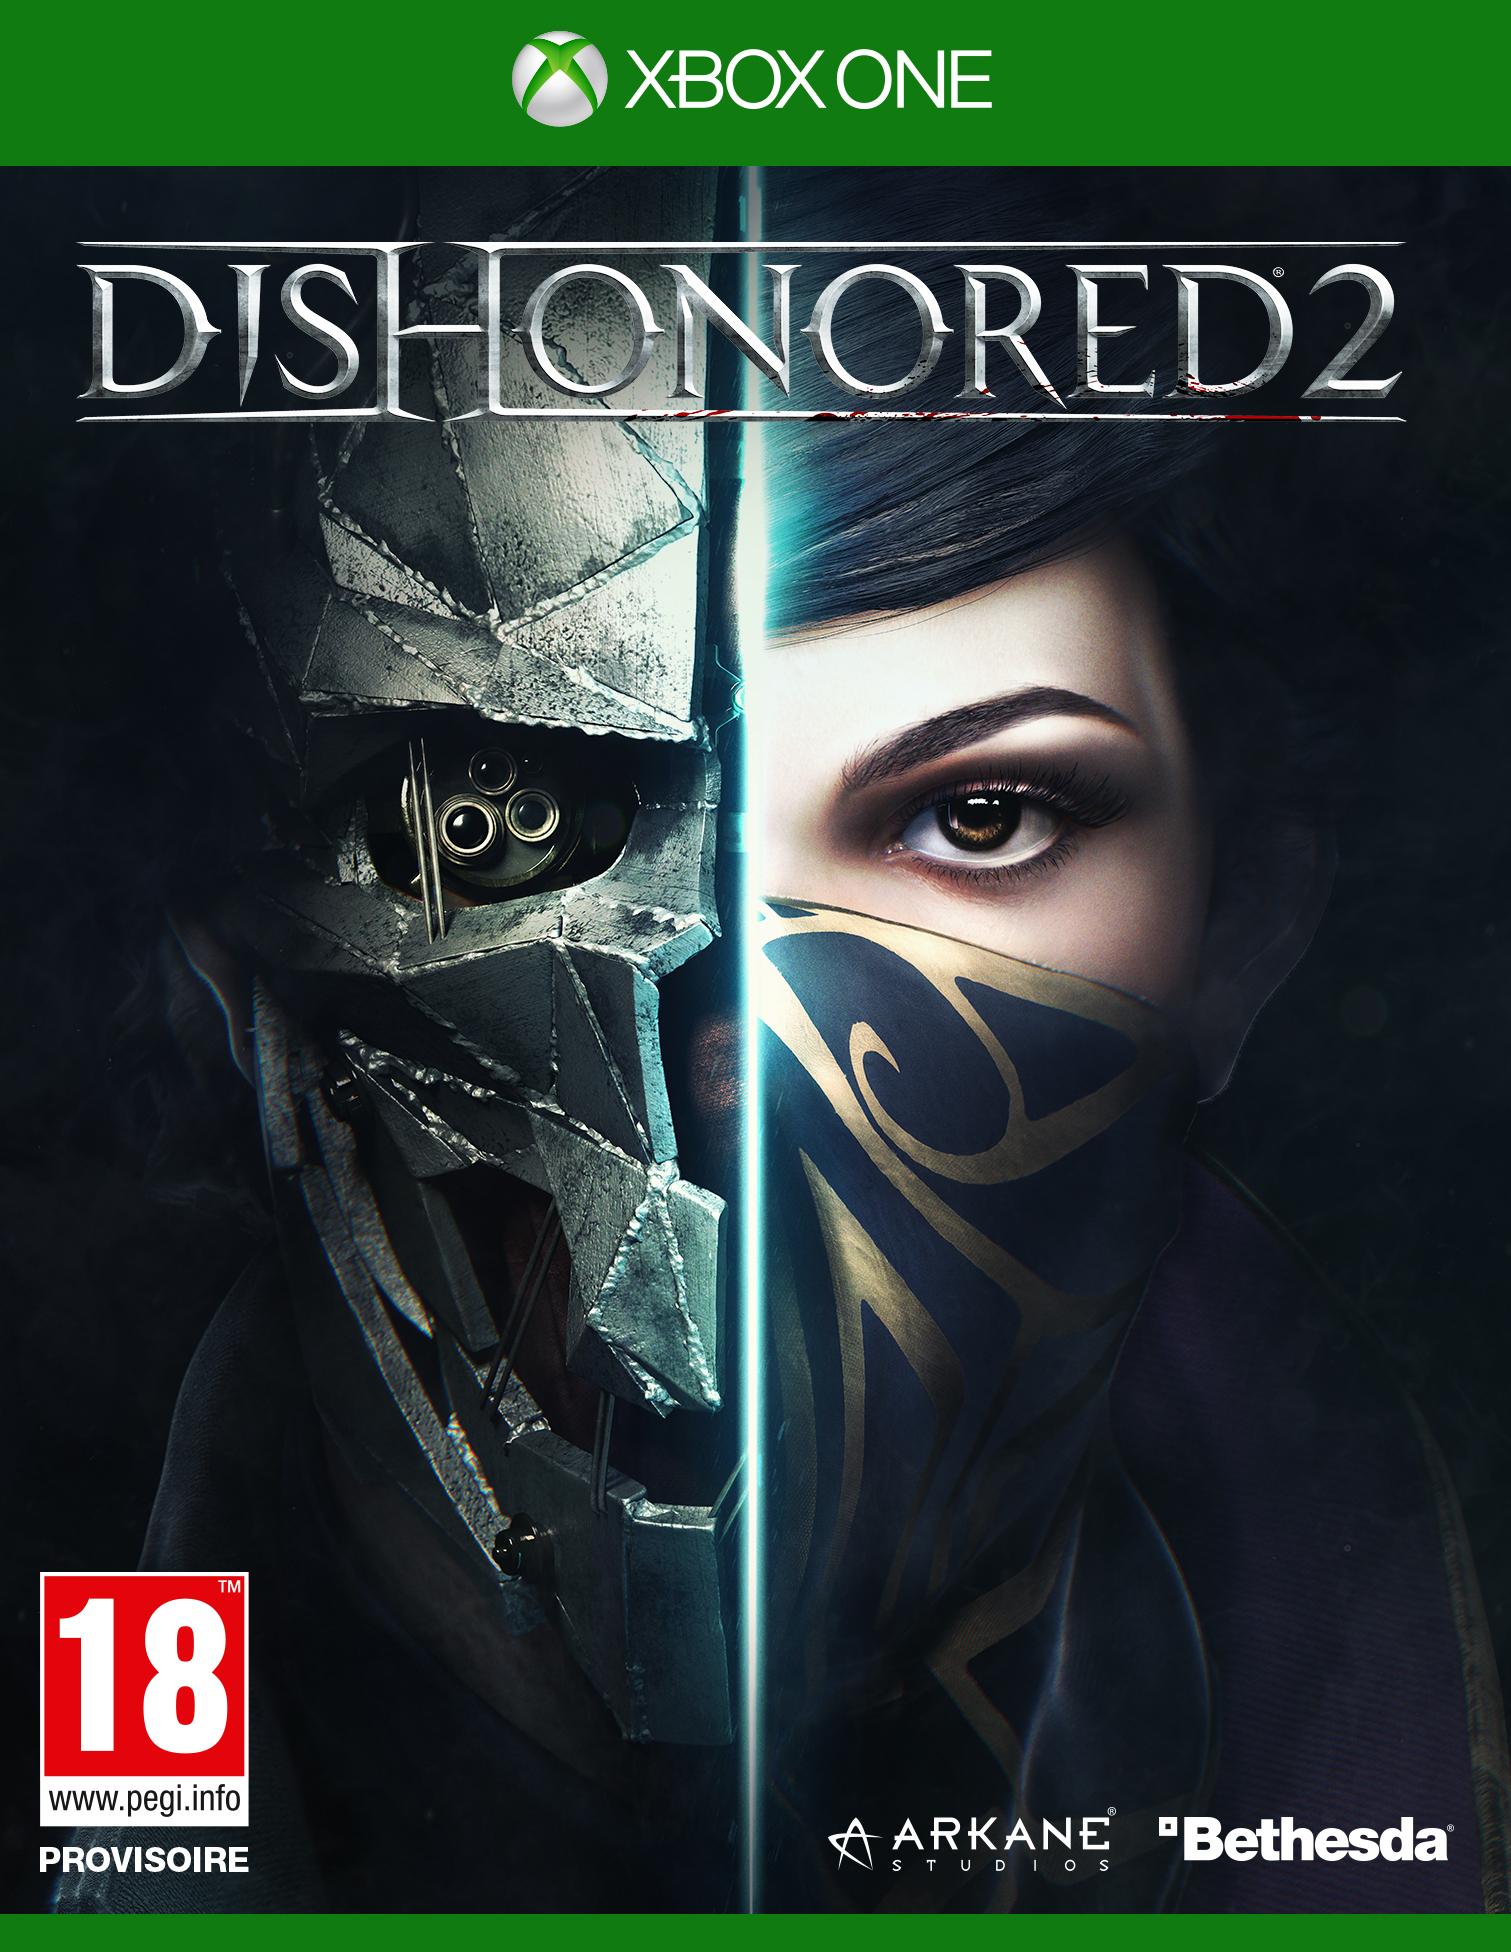 Jeu Dishonored 2 sur Xbox One (+0.31€ en SuperPoints)